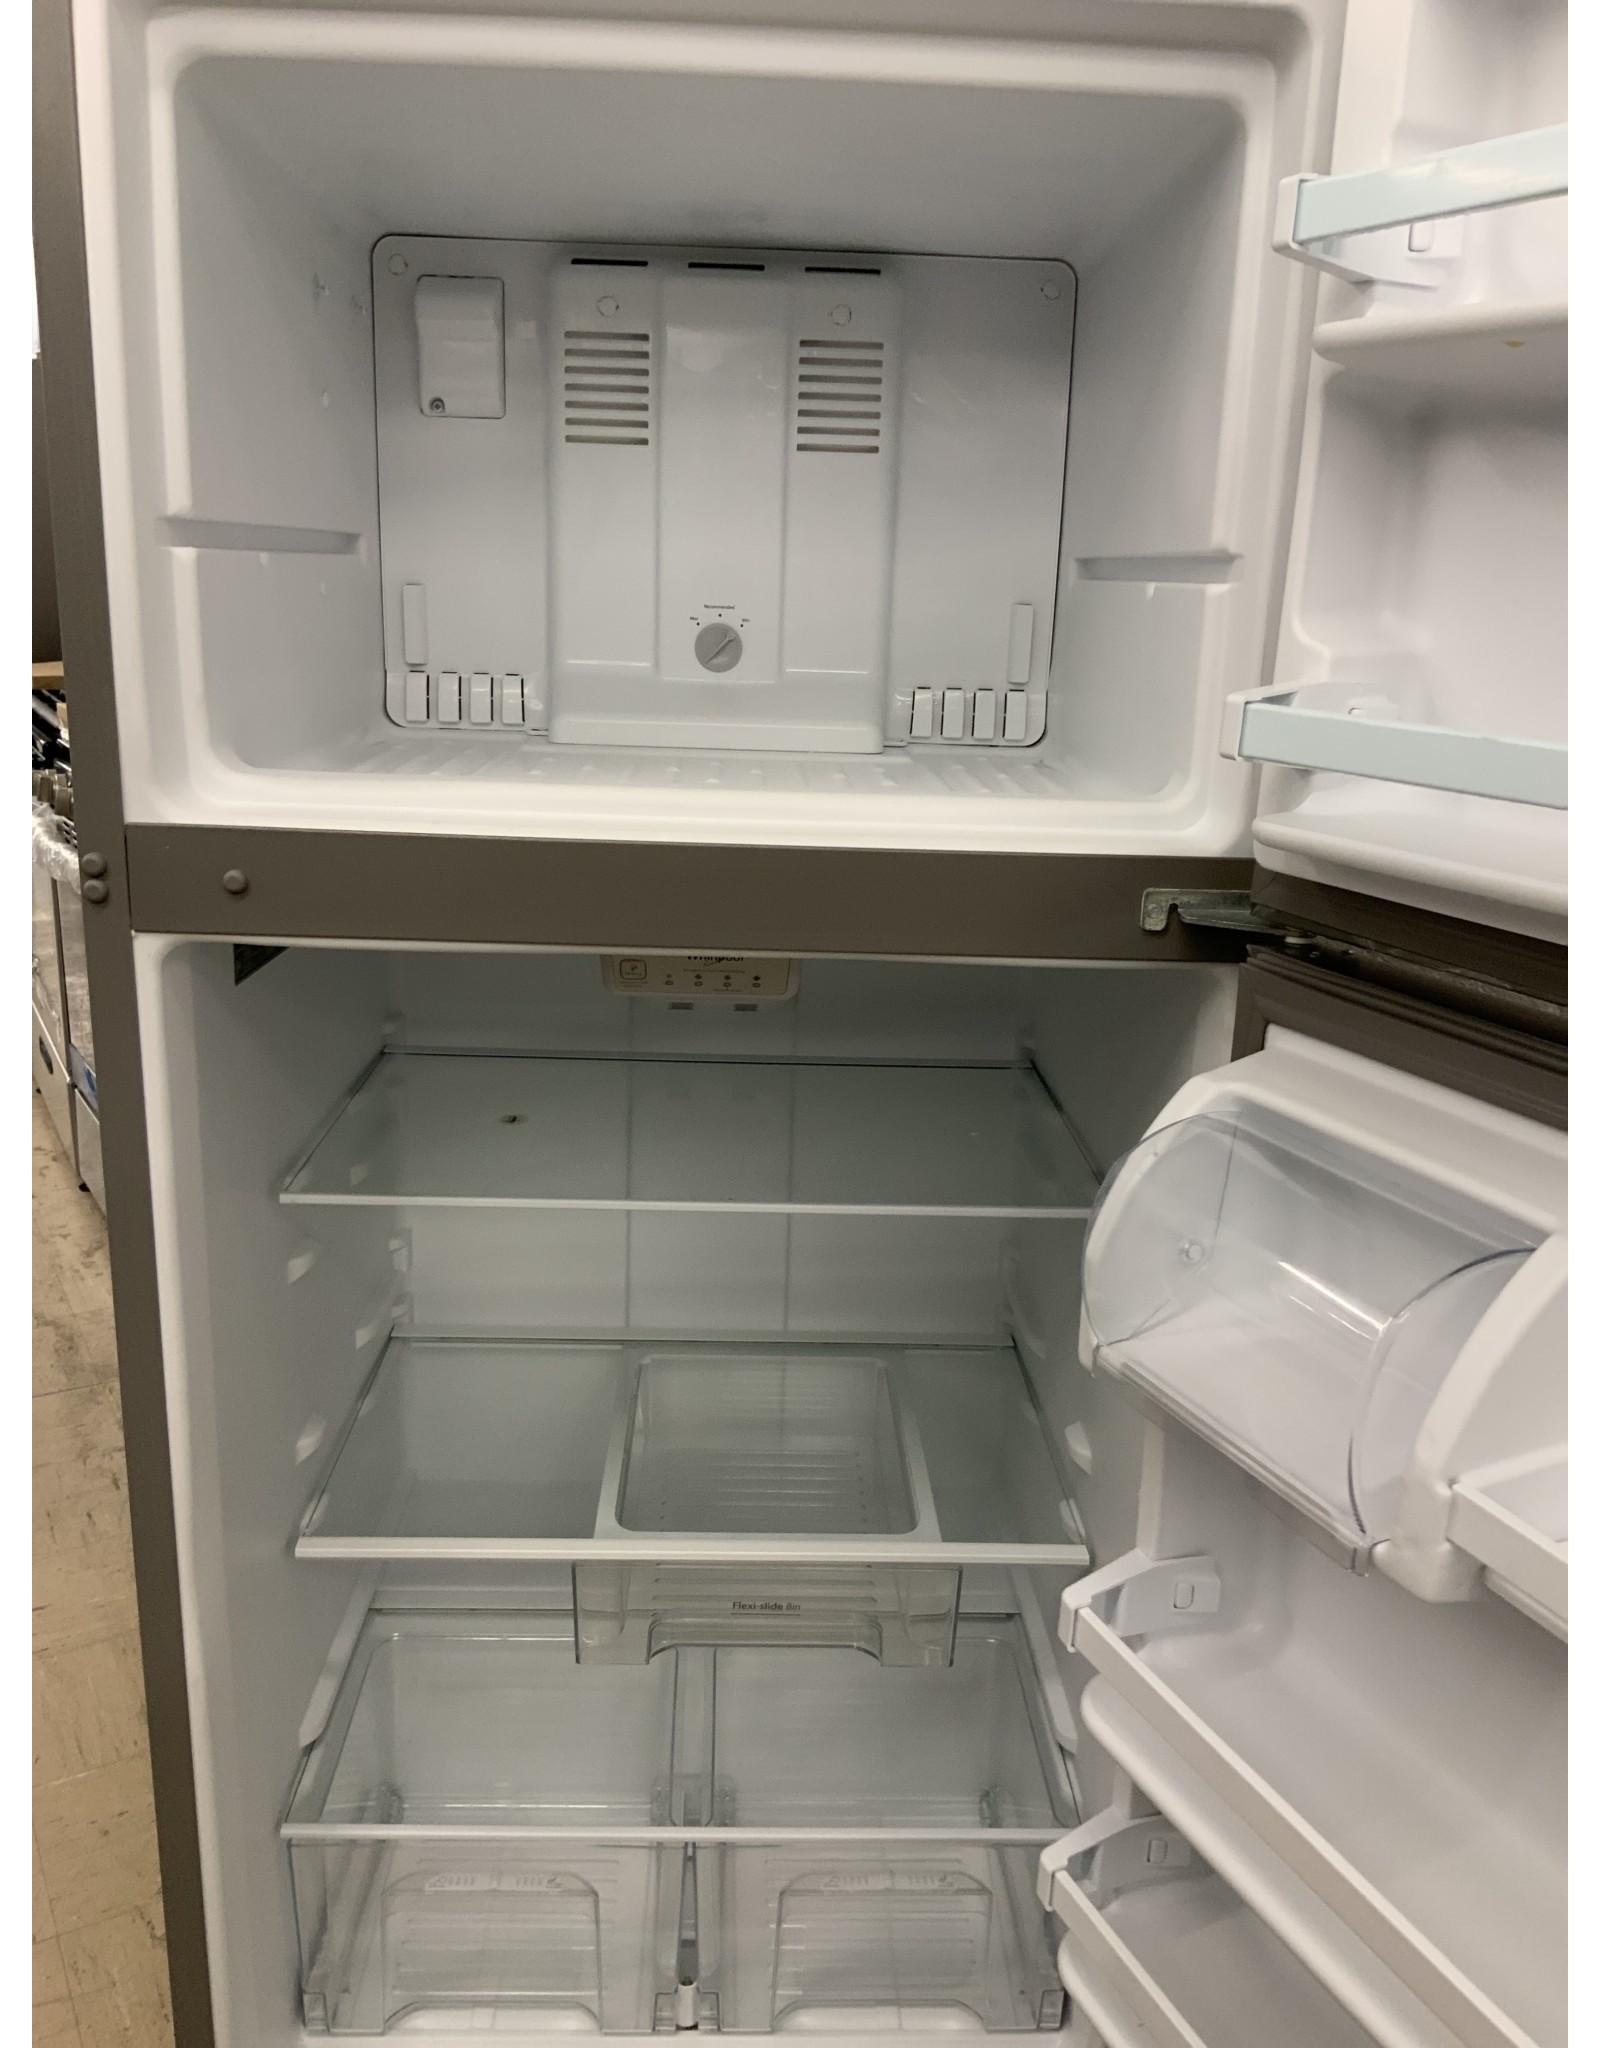 WRT318FZDM WHR No Frost Top - Free Standing Refr Frez - 18 CU FT; STD ENERGY/GLASS RC; SEMI-SMOO